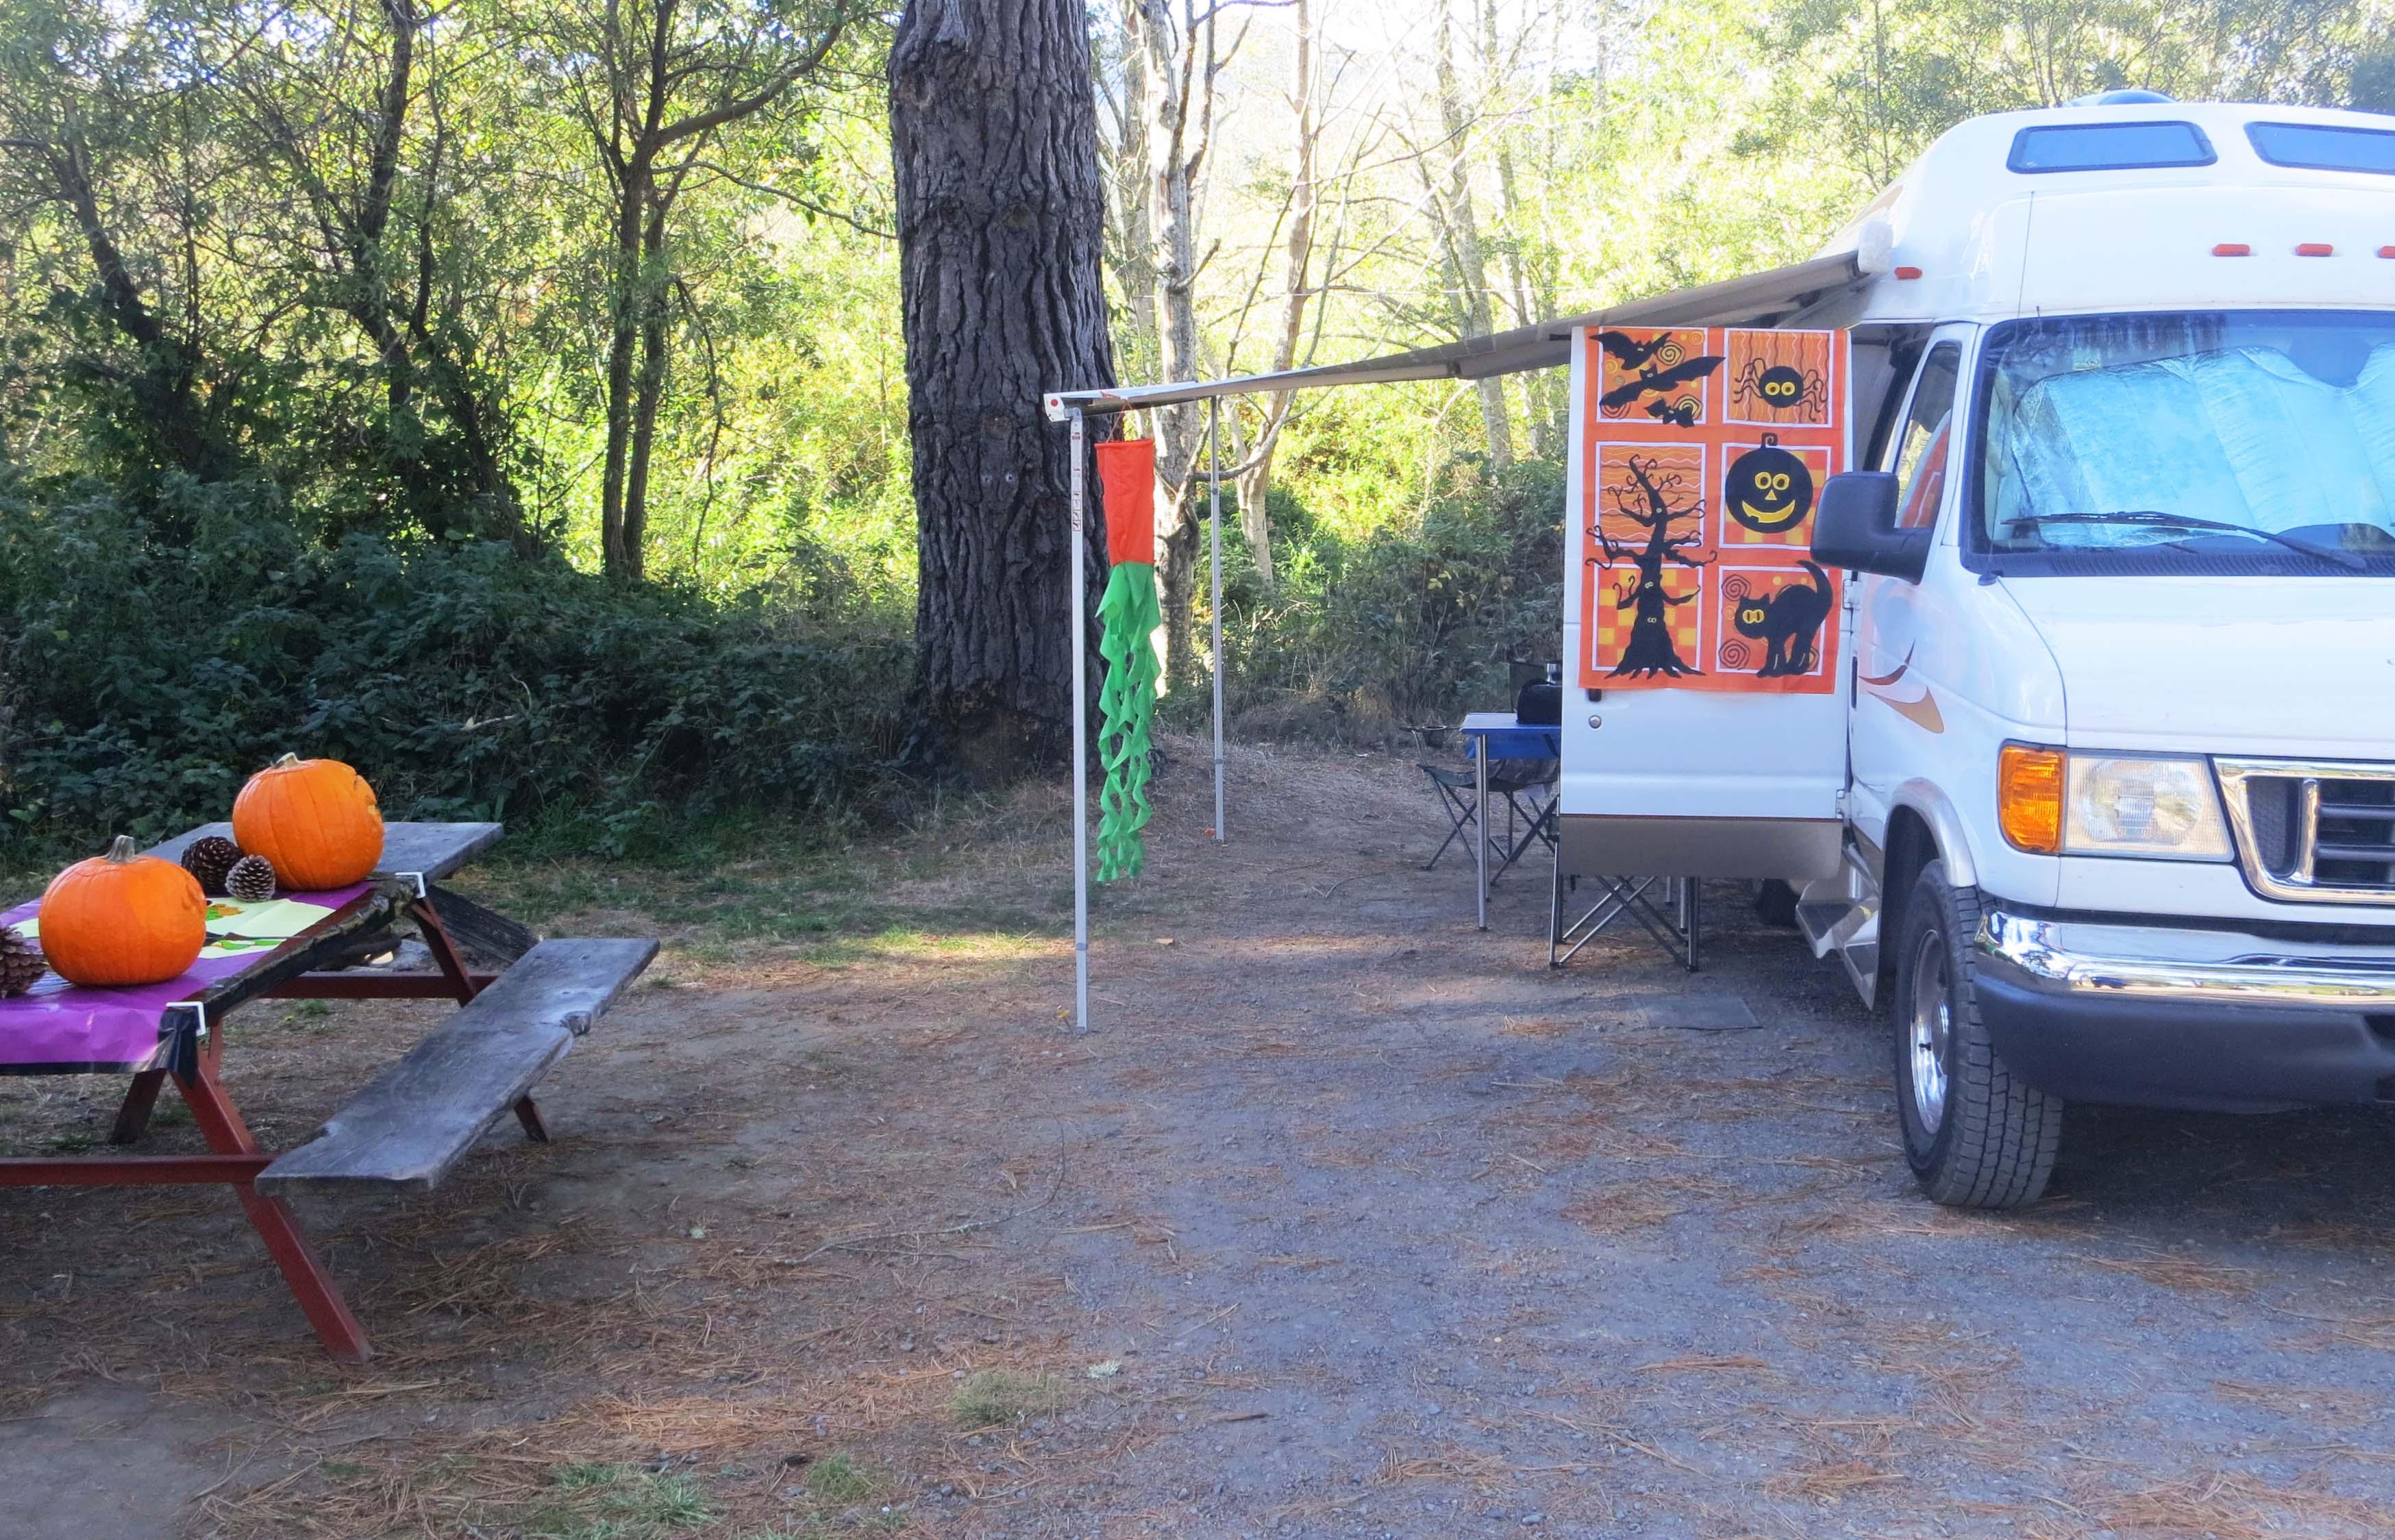 Photo of Olema Campground next to Pt. Reyes National Seashore by Curtis Mekemson.